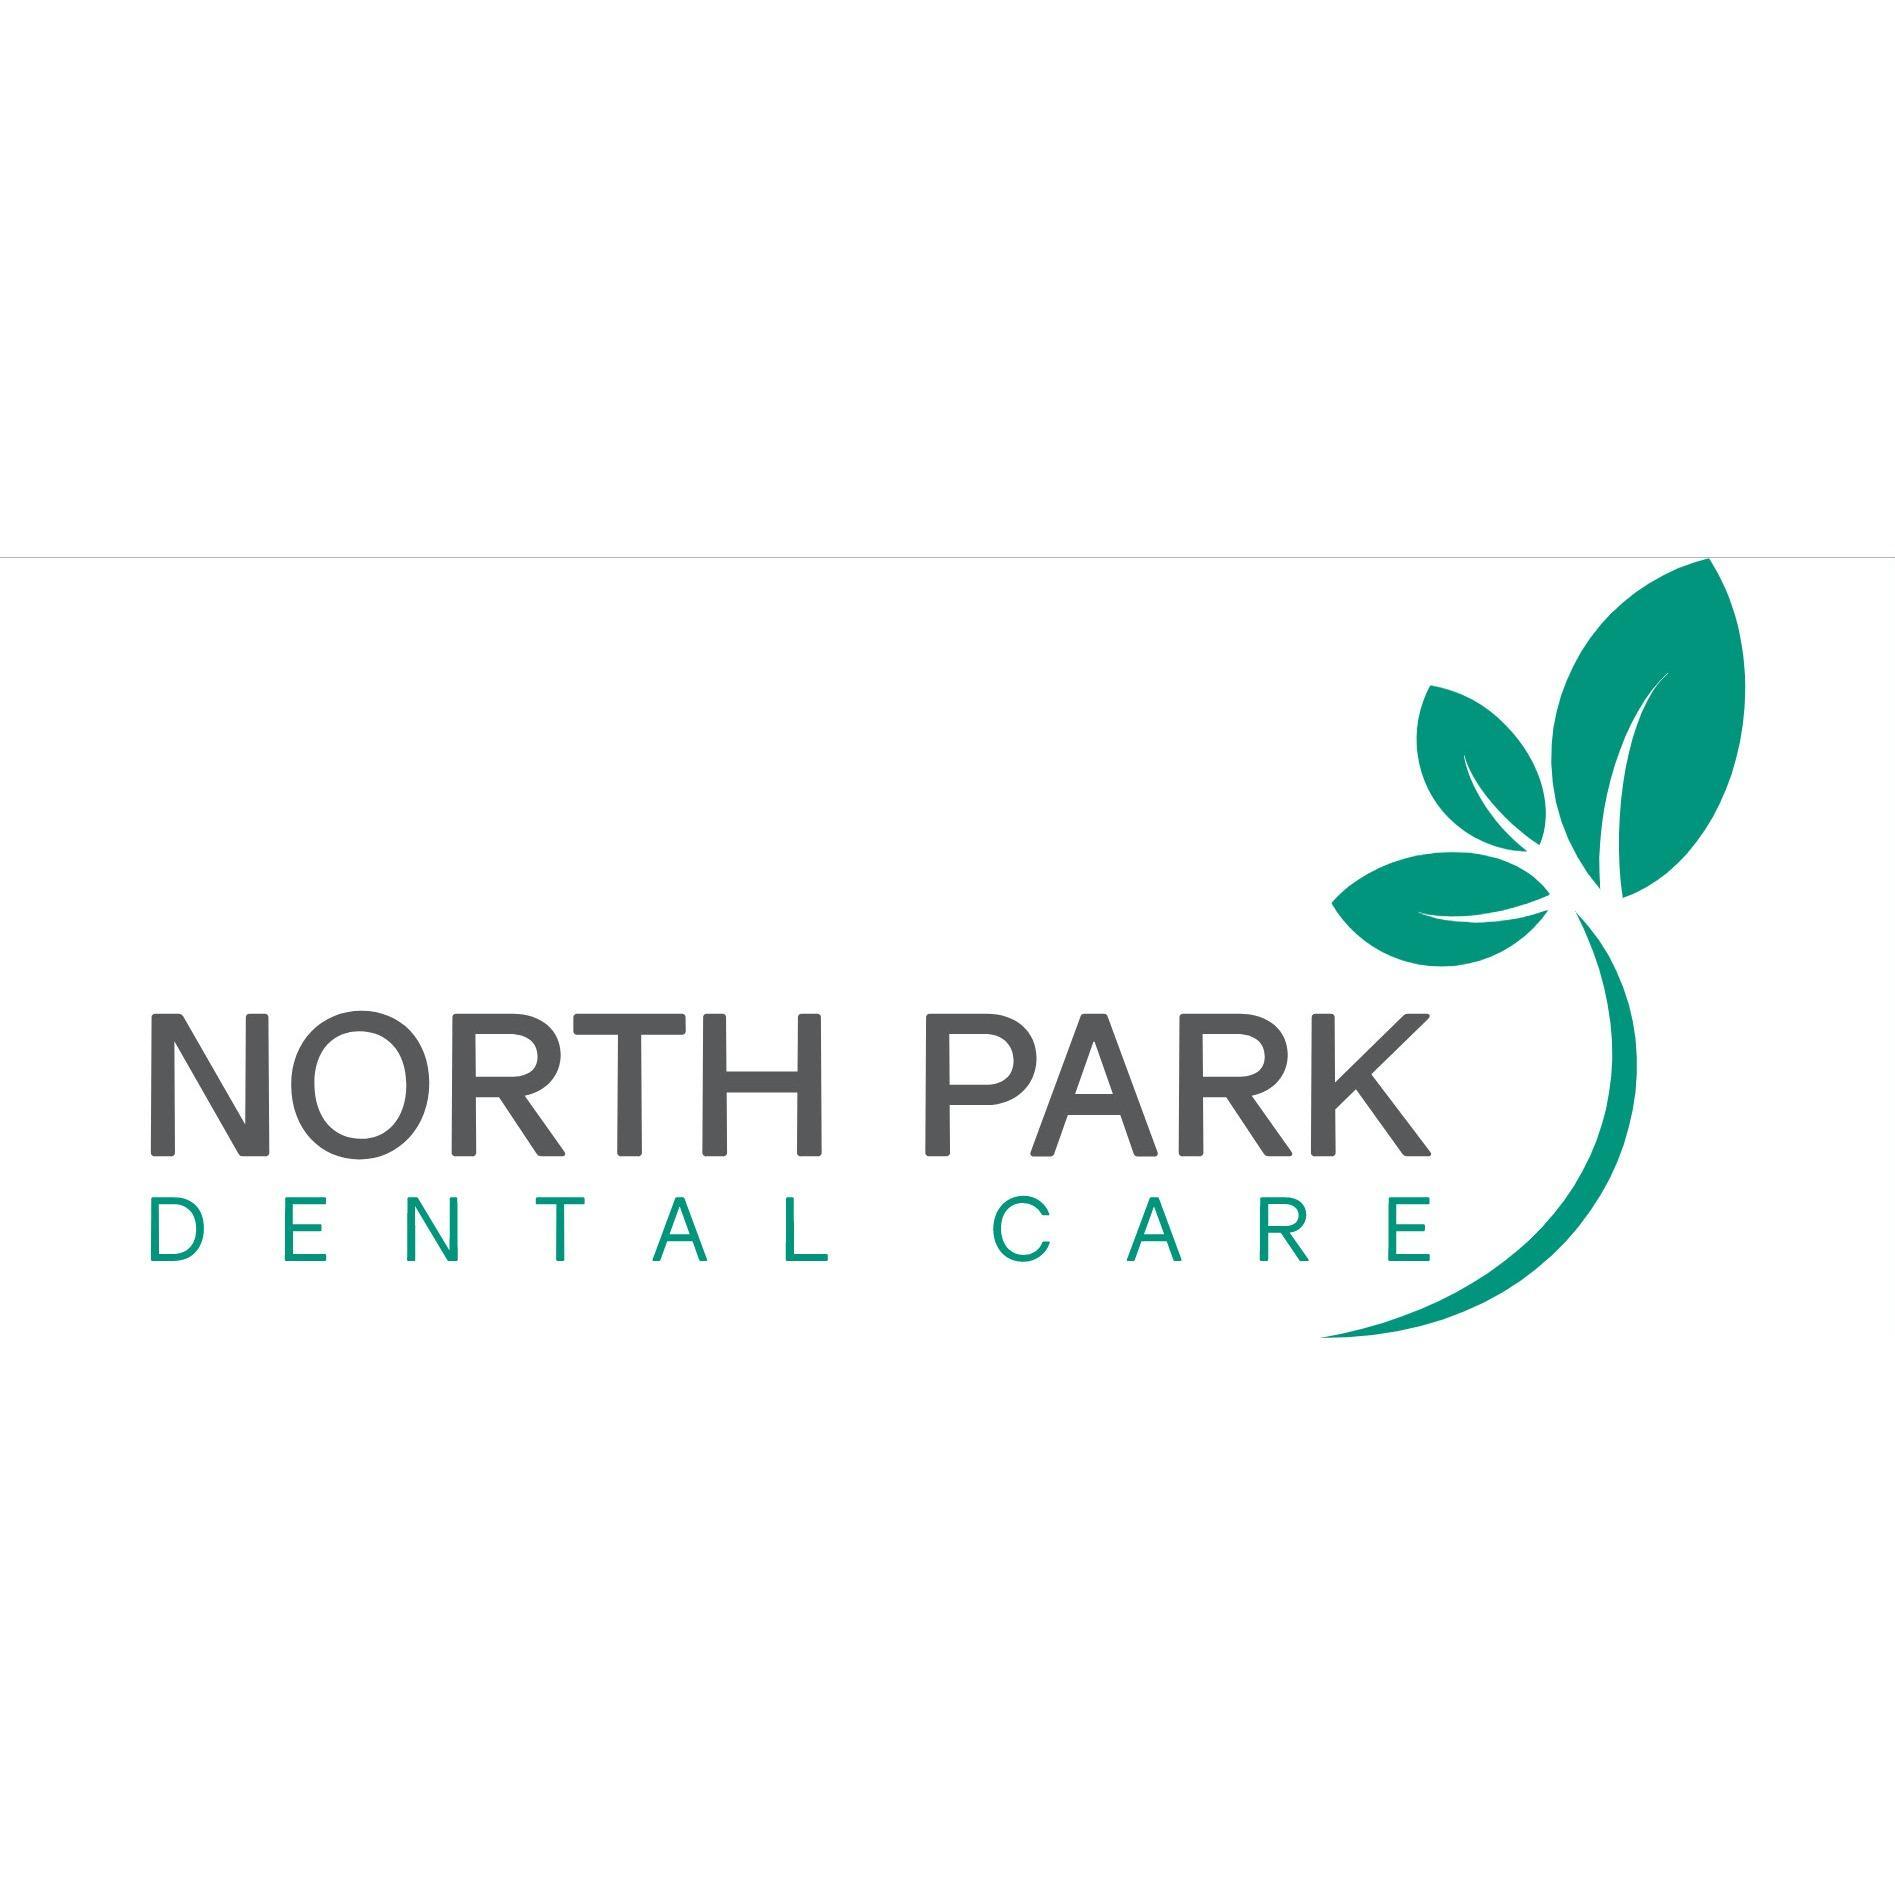 North Park Dental Care